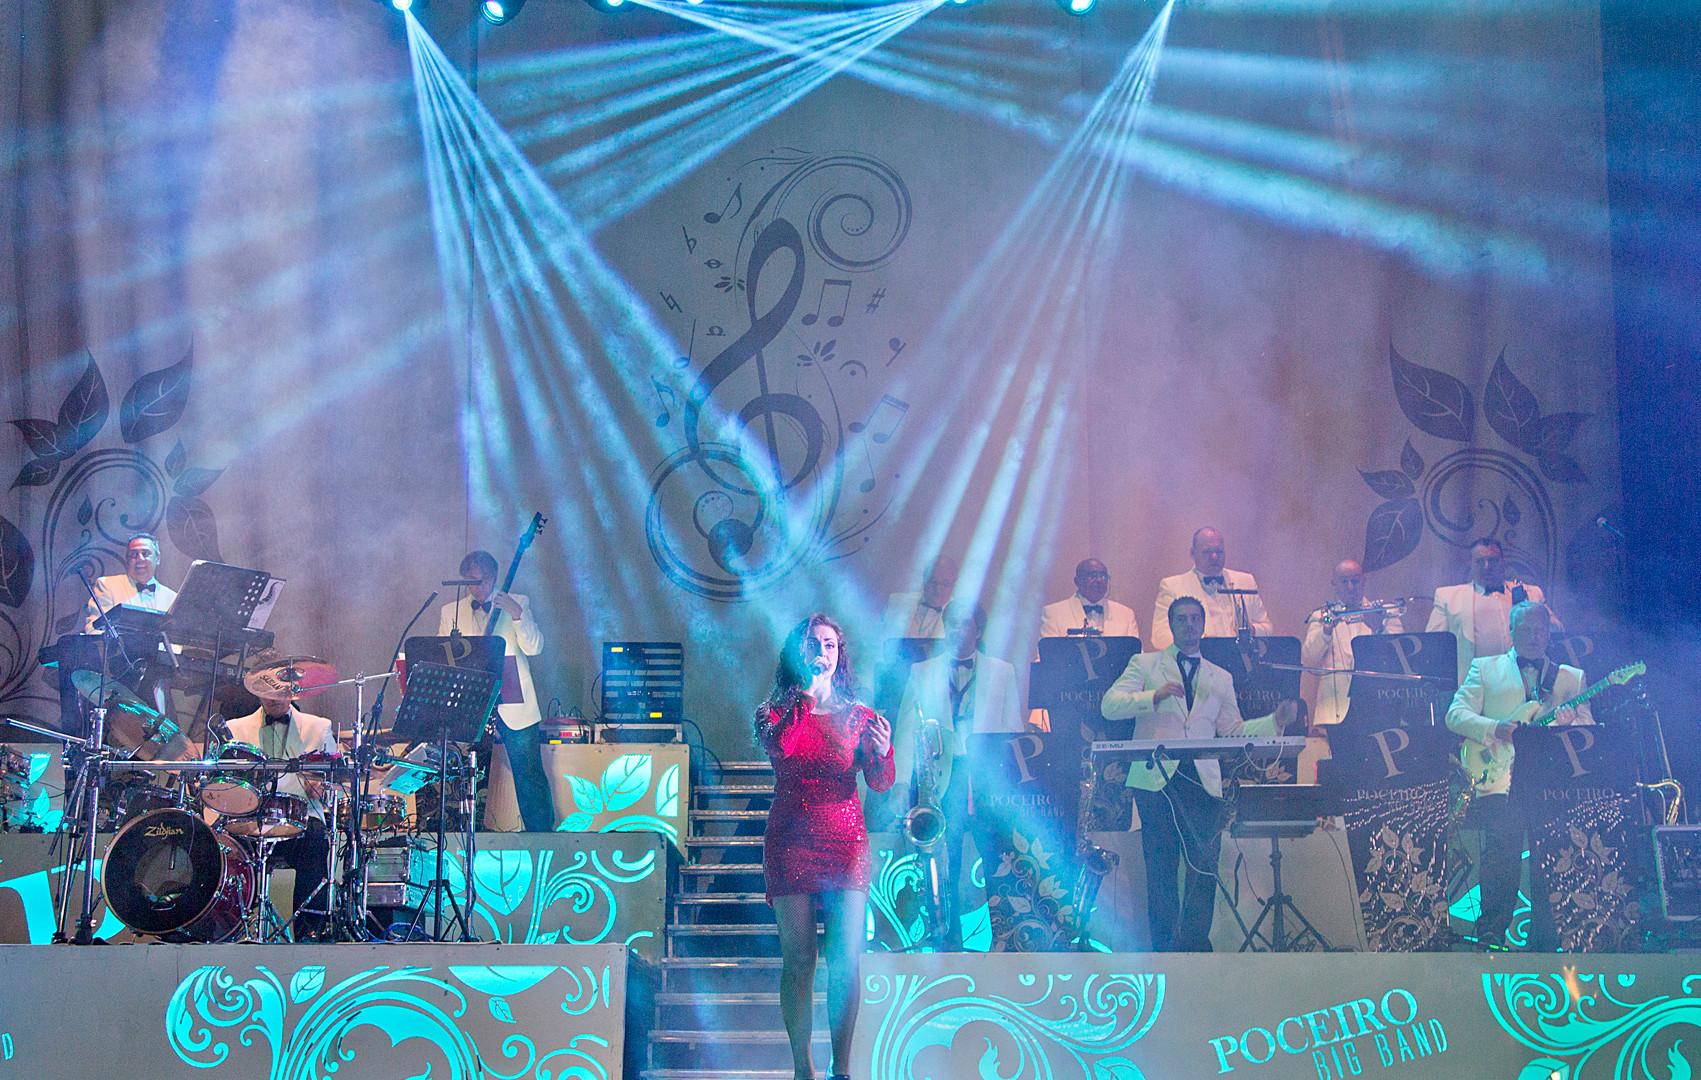 POCEIRO Big Band